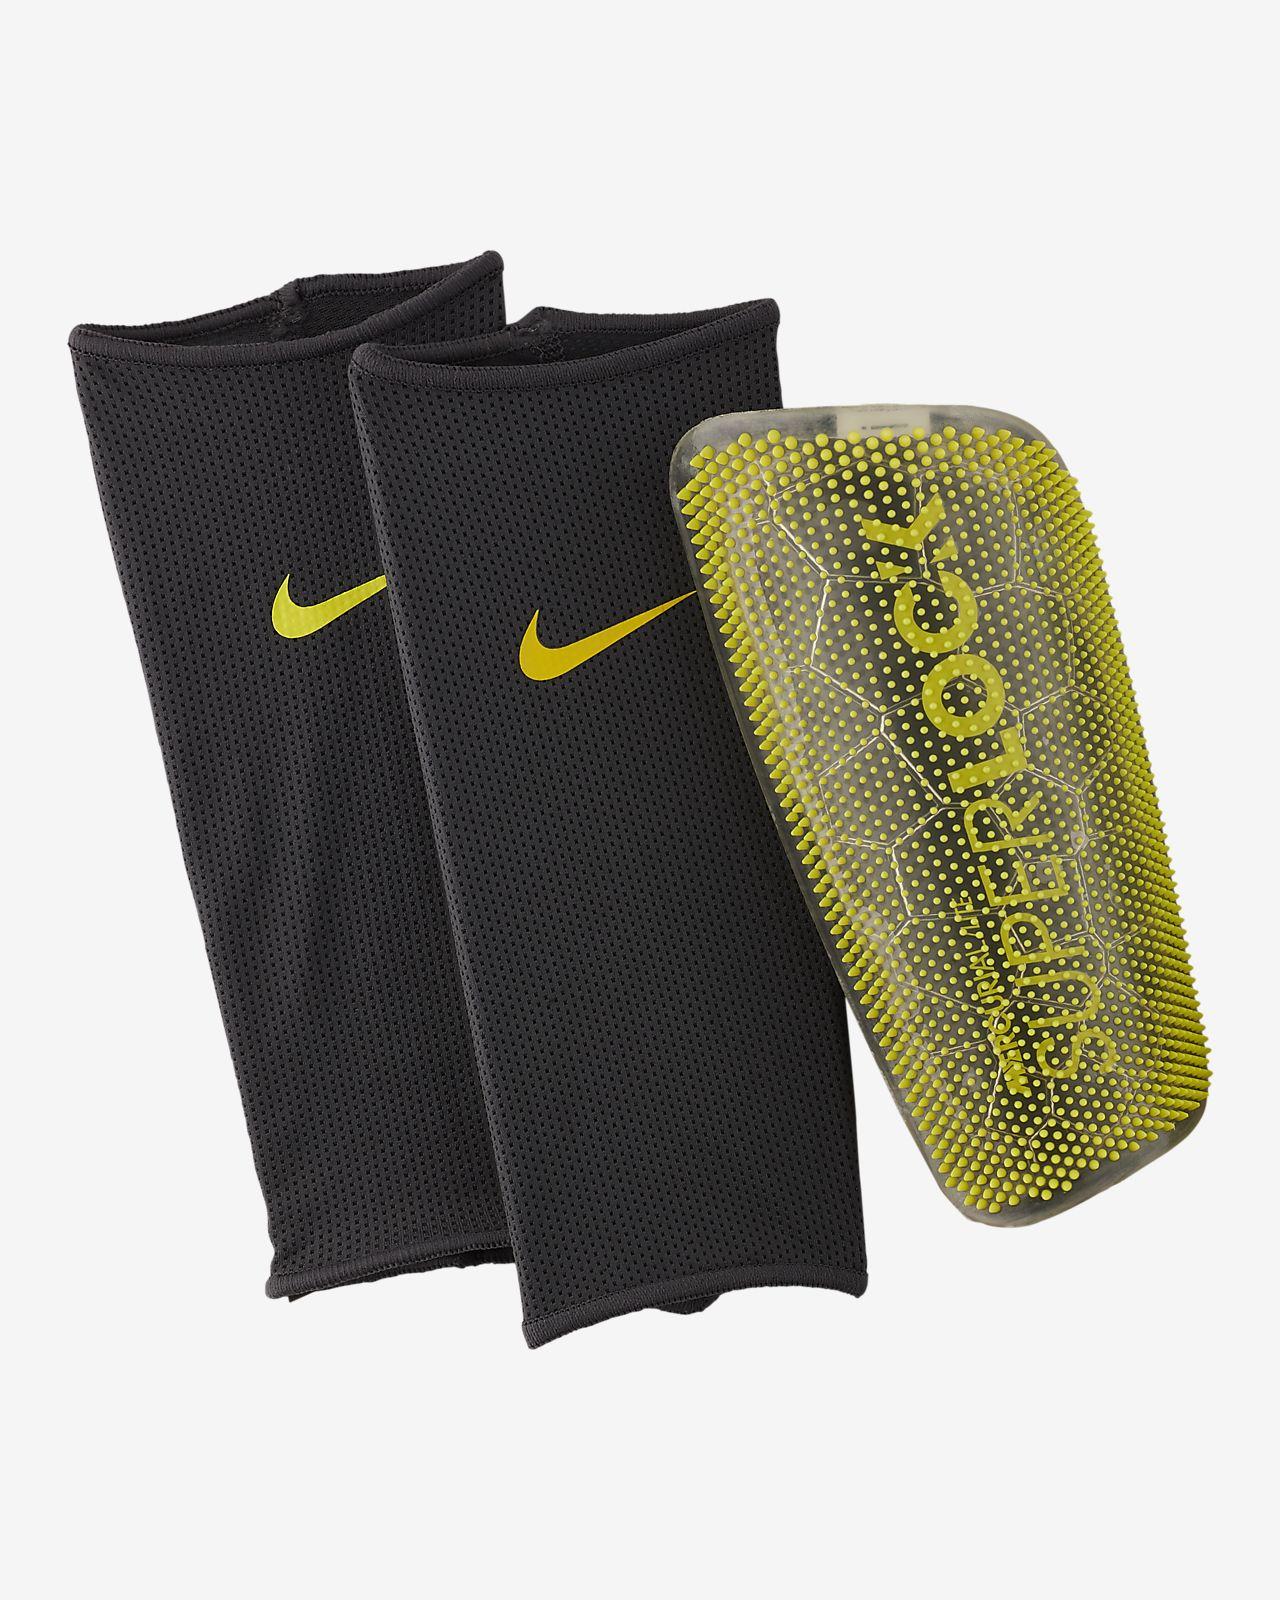 Protège-tibias de football Nike Mercurial Lite SuperLock